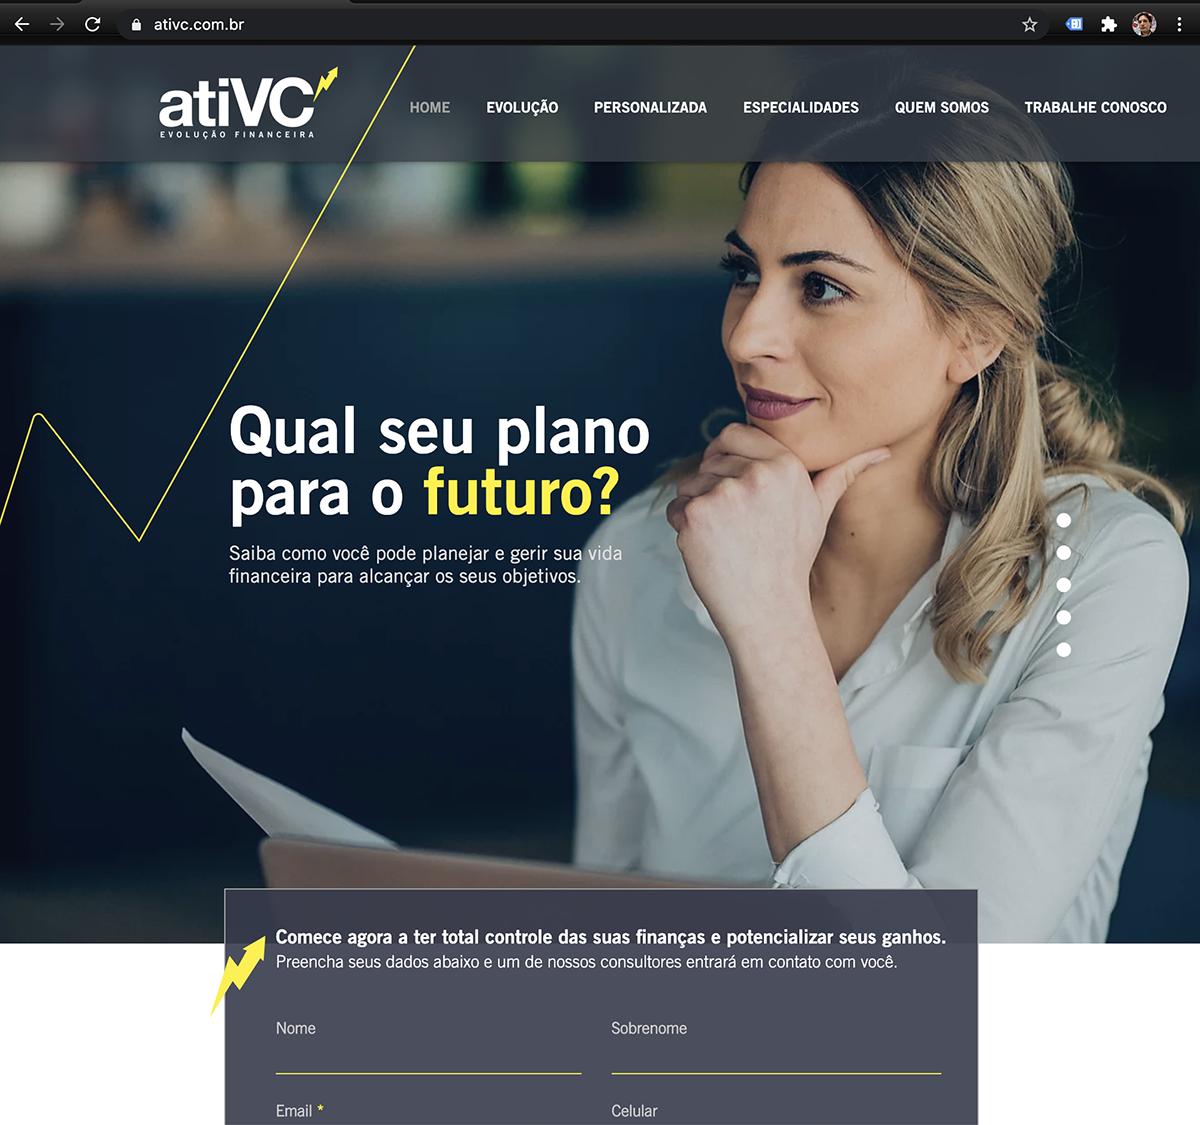 AtiVC